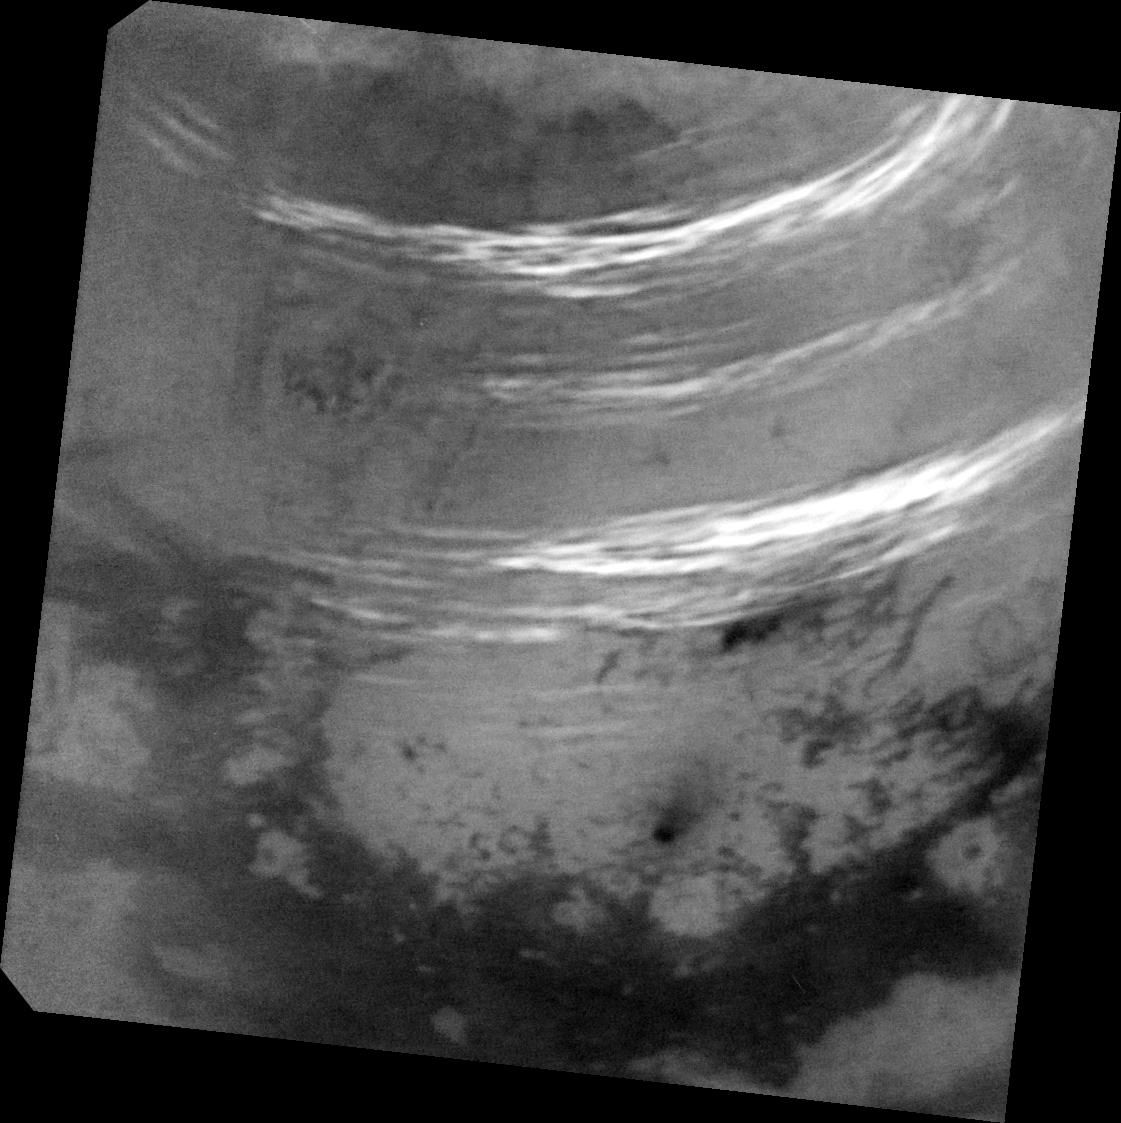 Titan\'s Northern Summer Clouds (NASA Cassini Saturn Mission Image)